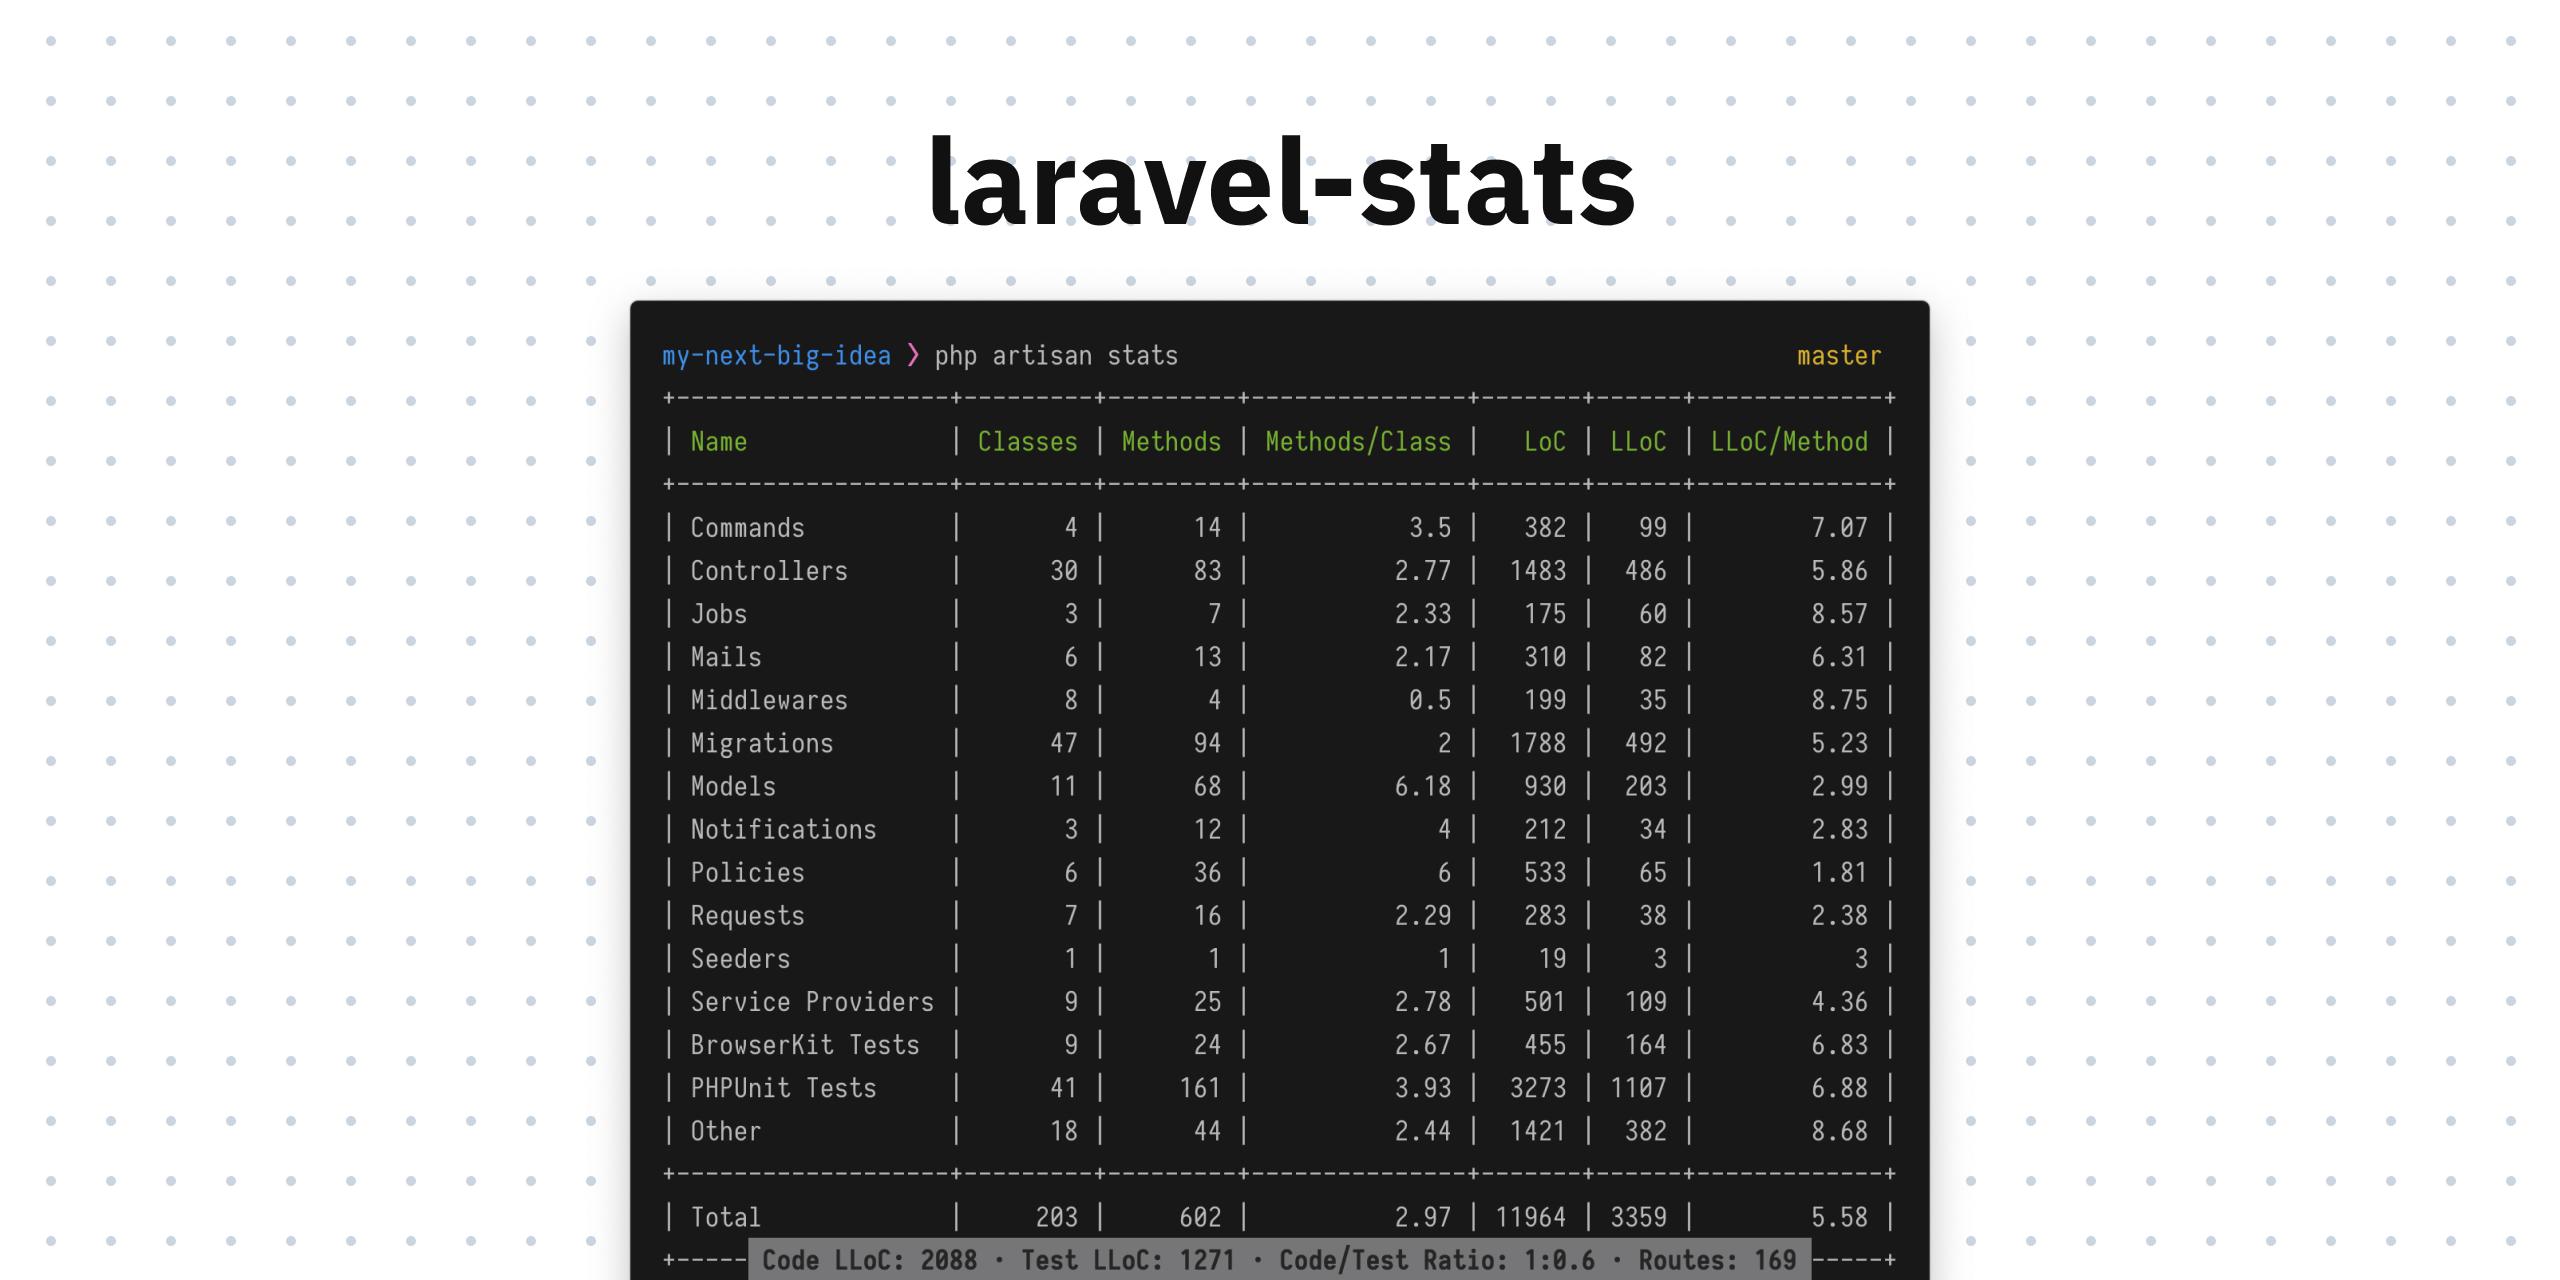 laravel-stats